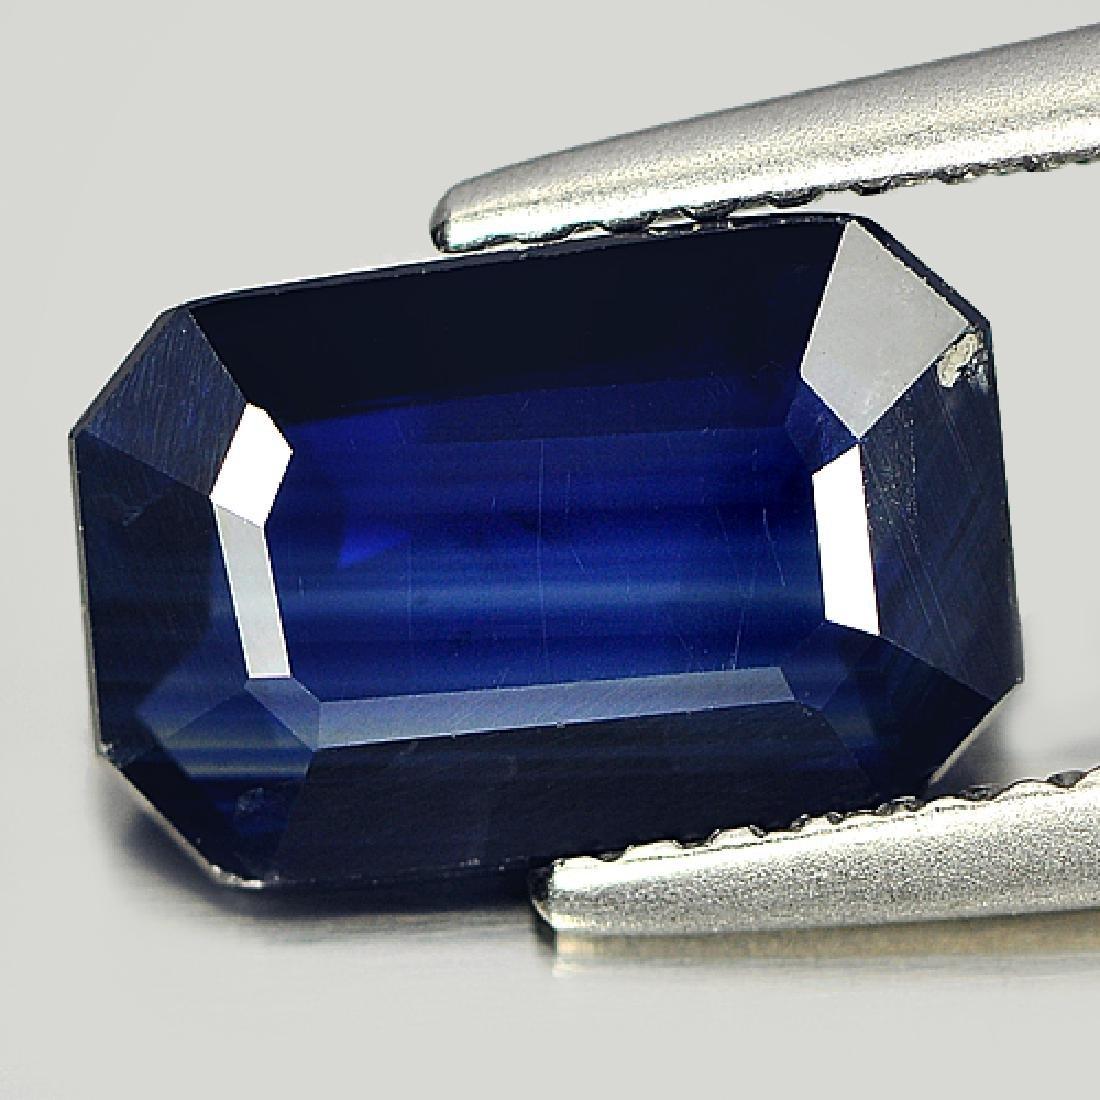 Ceritfied 1.92 Ct. Octagon Shape Natural Blue Sapphire - 2